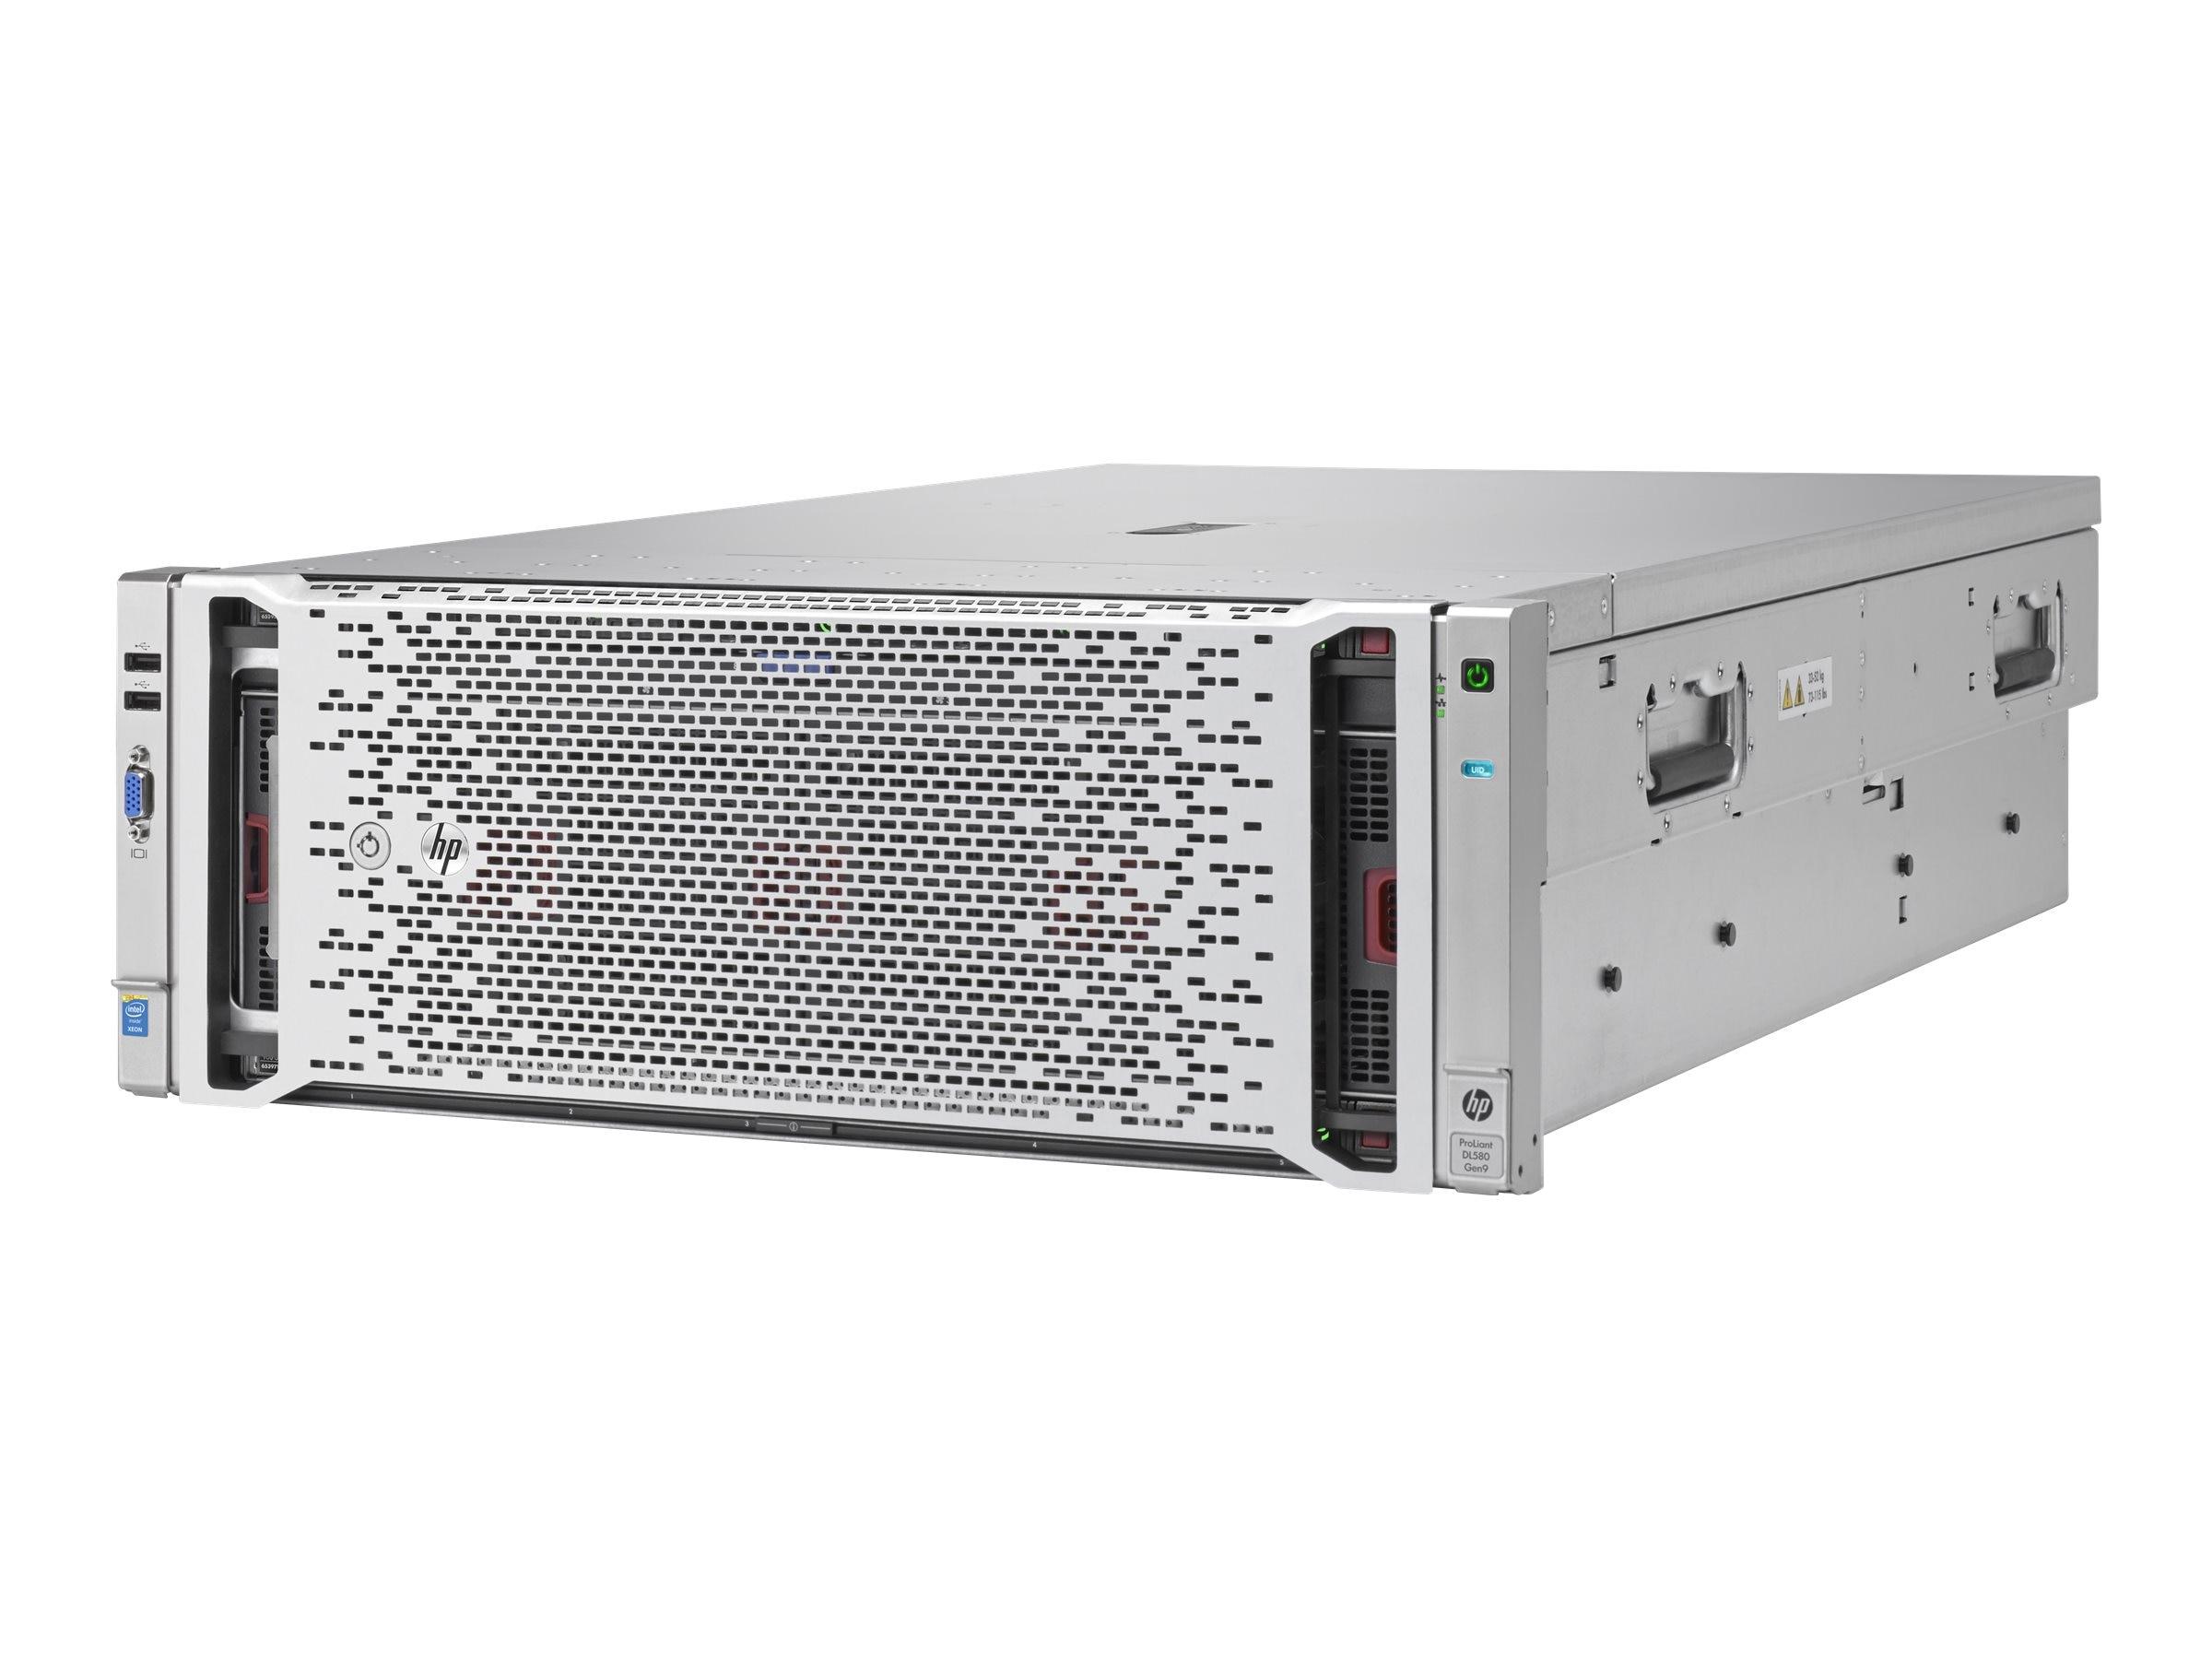 -1 Intel 3.2GHz Xeon